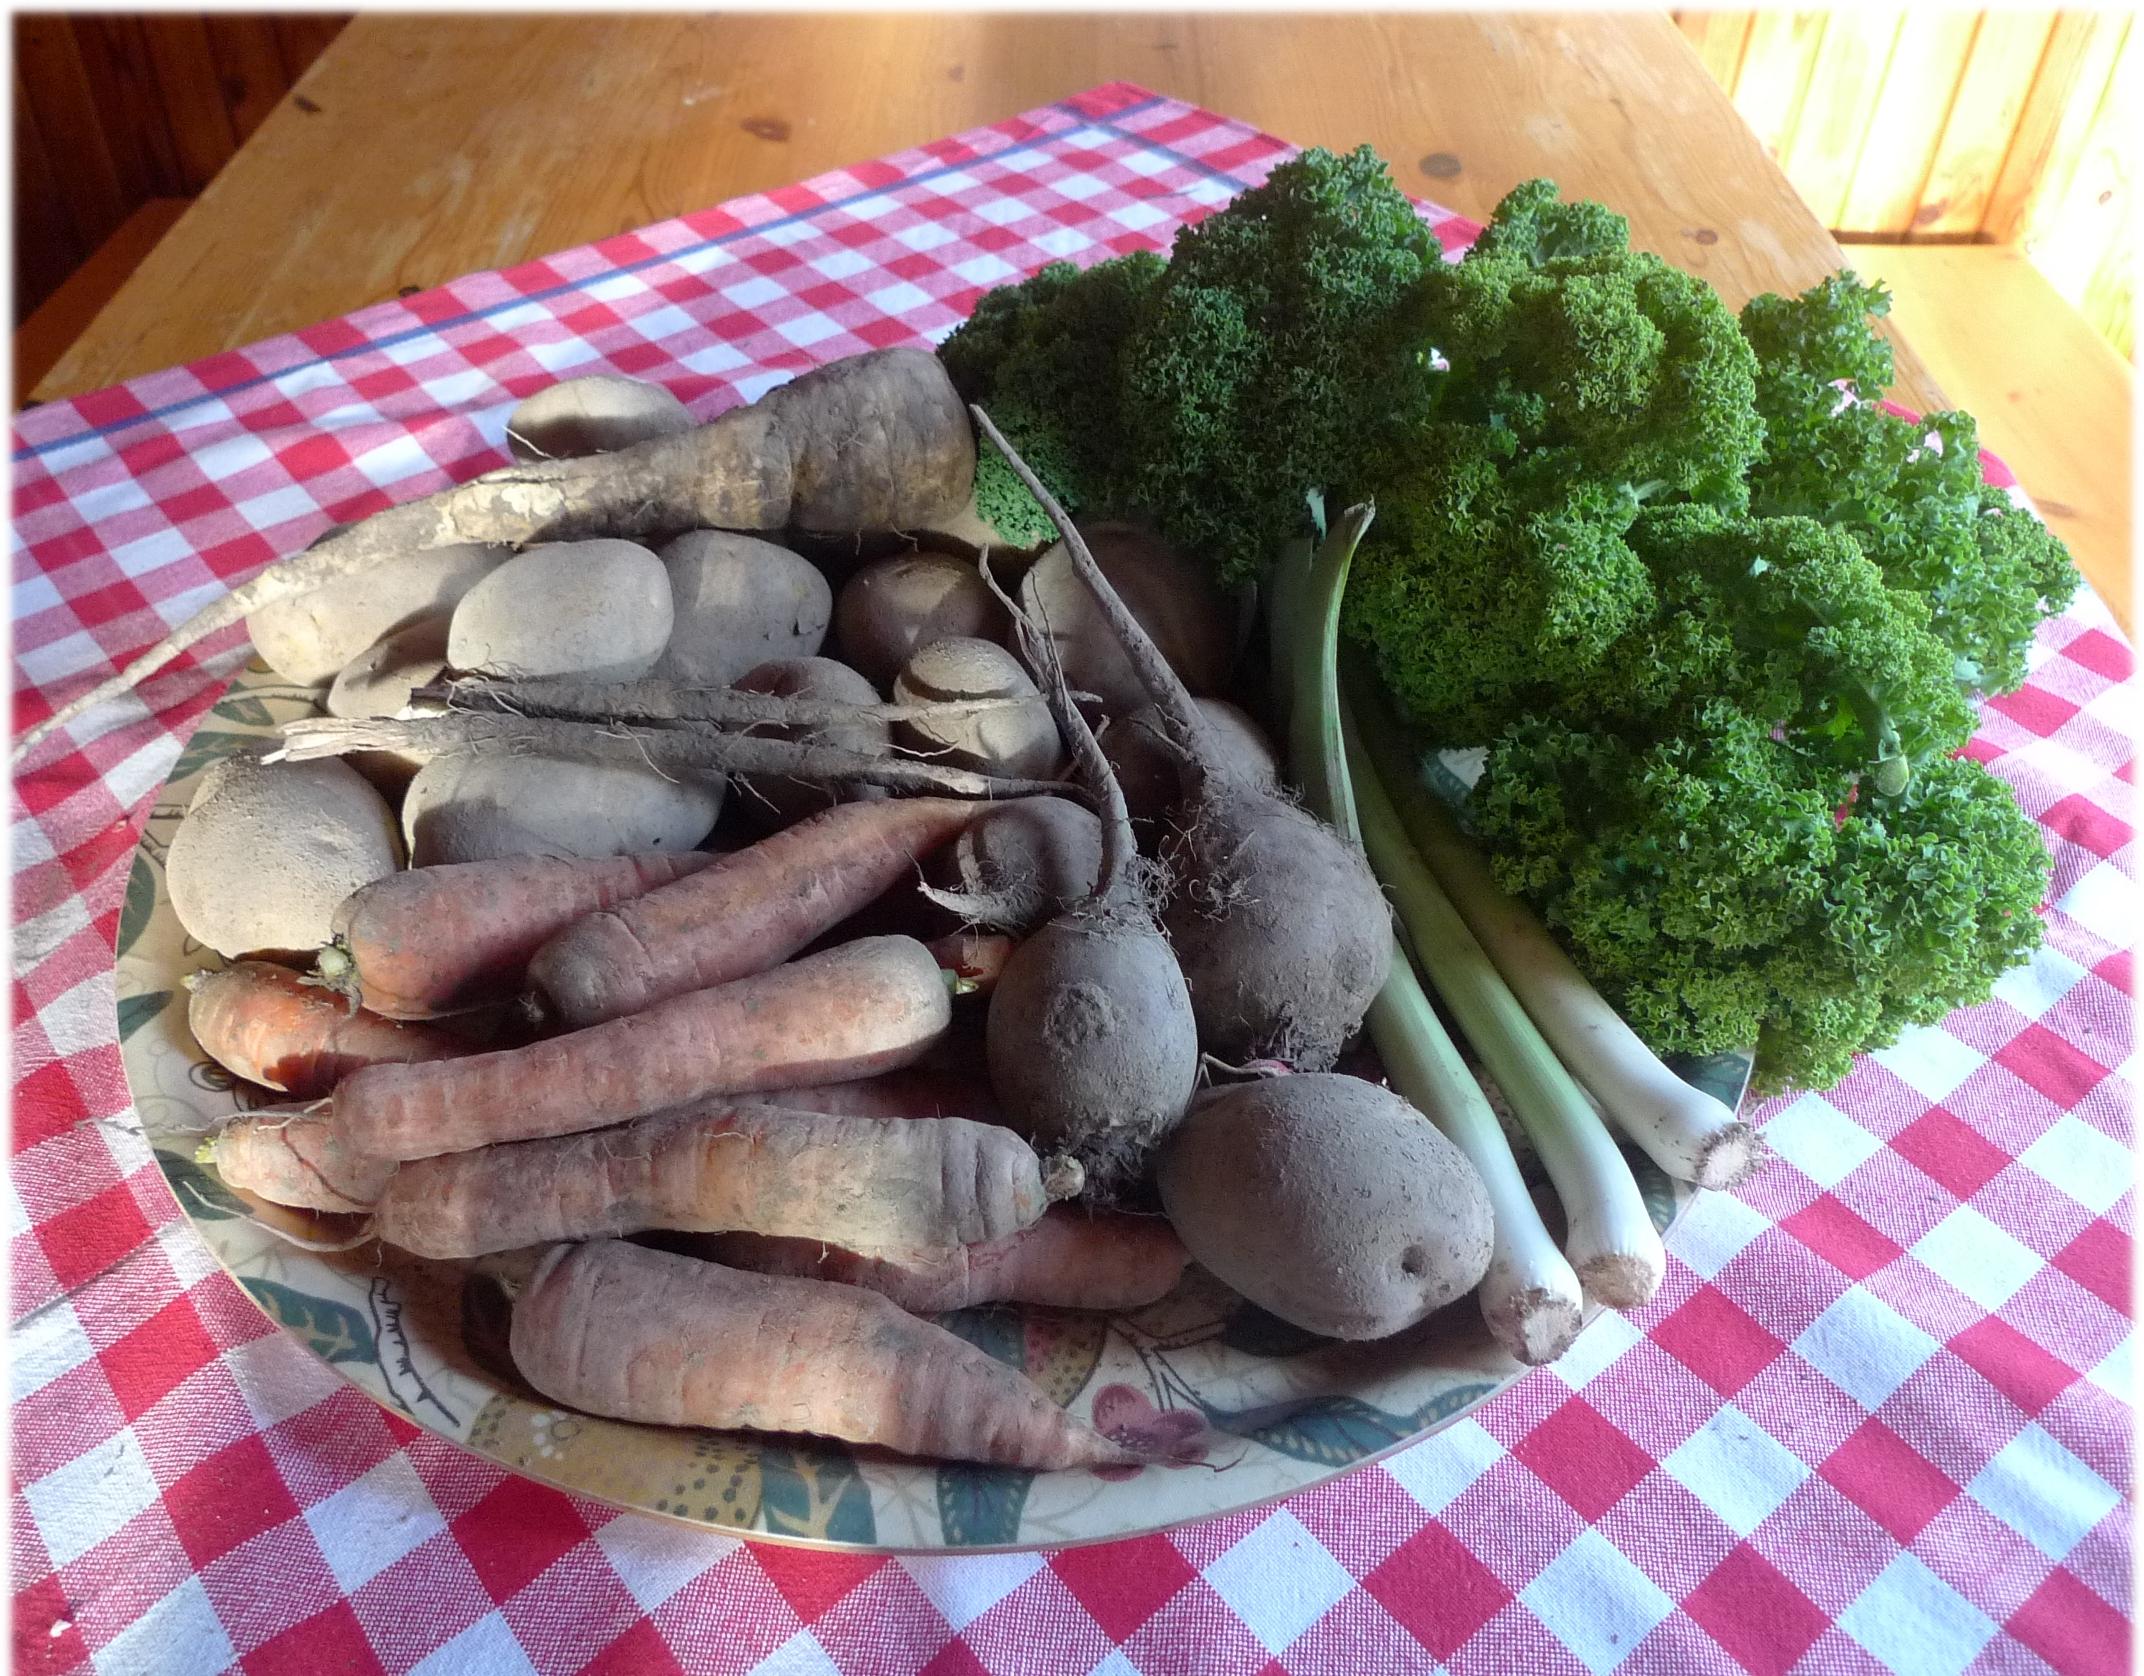 29.10.2013: lehtikaali 228 g, palsternakka 193 g, mustajuuret 18 g, punajuuret 464 g, purjot 181 g, porkkanat 713 g ja perunat 2006 g.